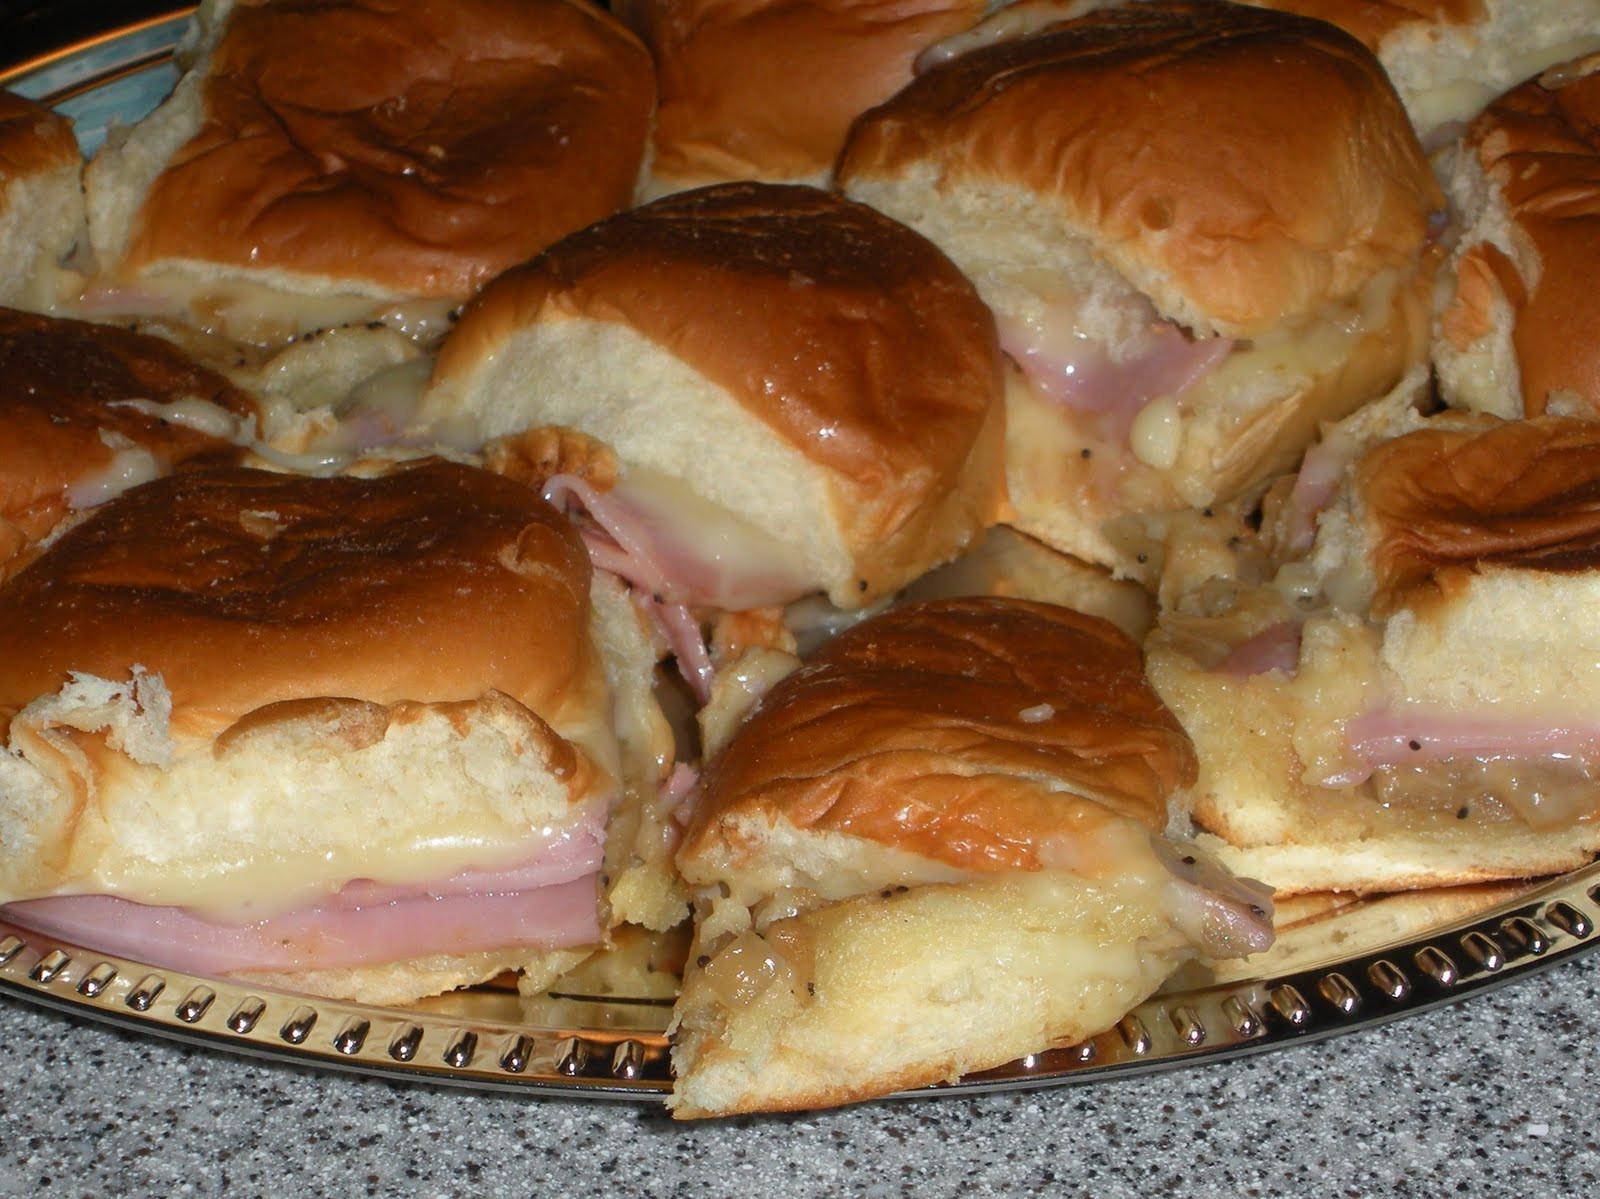 Hawaiian Bread Ham Sandwiches  NOT A REAL HOUSEWIFE Mini Ham Sandwiches on Hawaiian Rolls